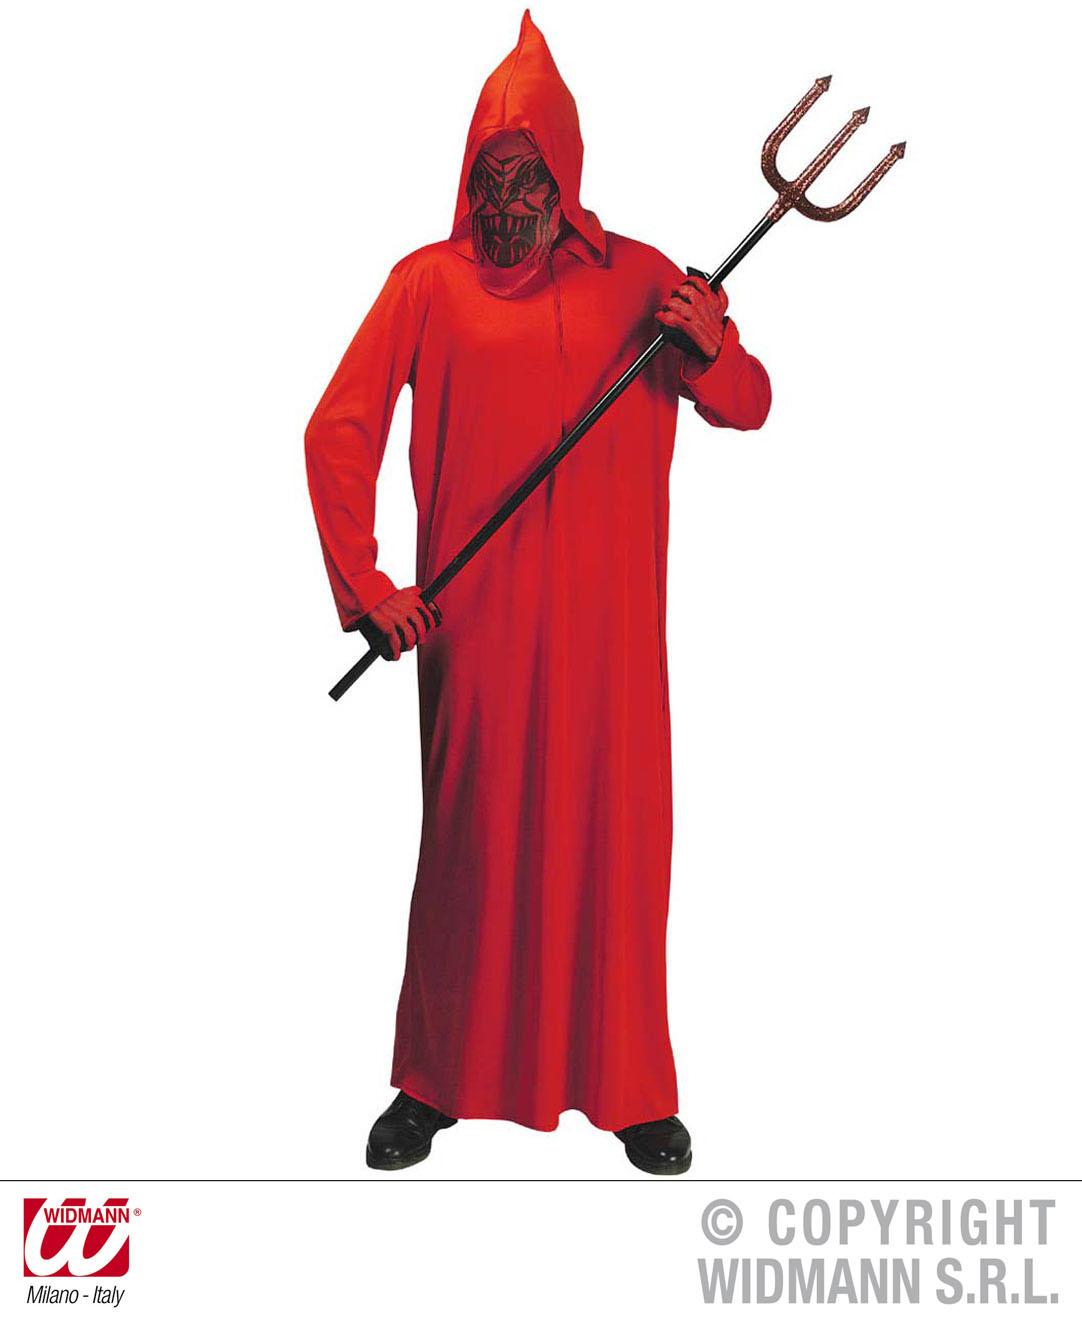 Teufel Kostüm mit Kapuzenmaske rot,Kinder, 0249 Karneval,128,140,158